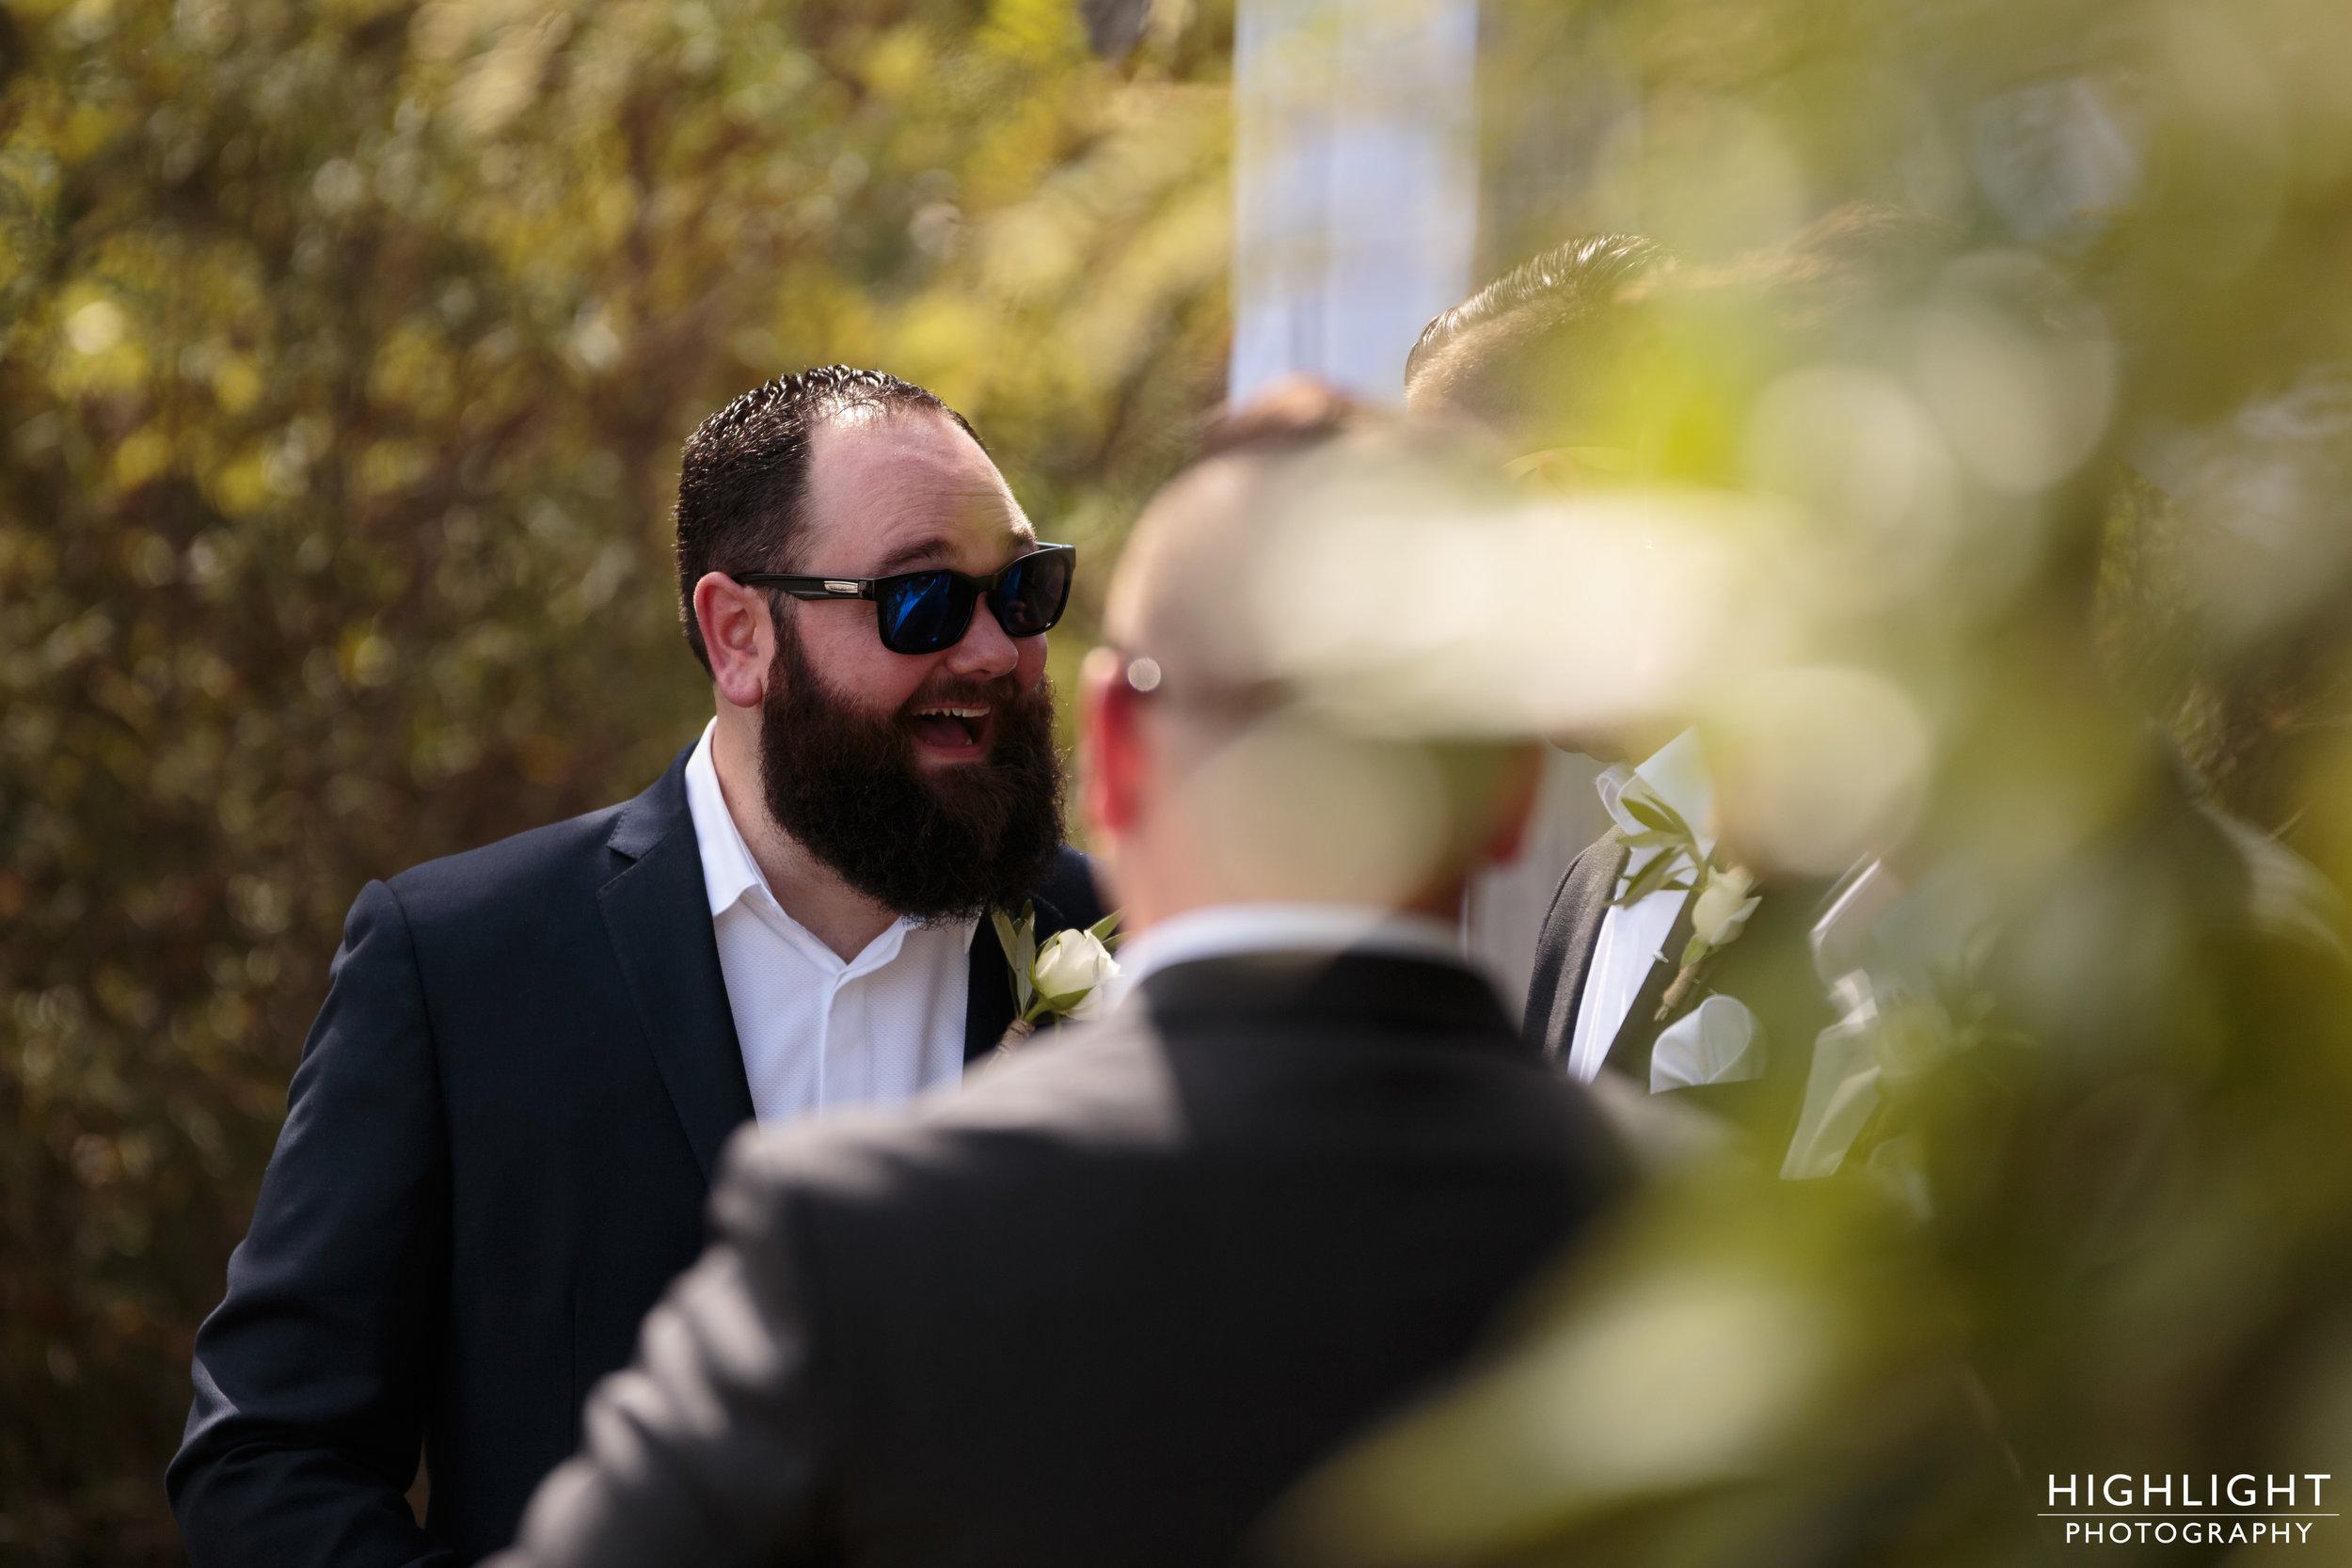 highlight-wedding-photography-new-zealand-makoura-lodge-wedding-43.jpg